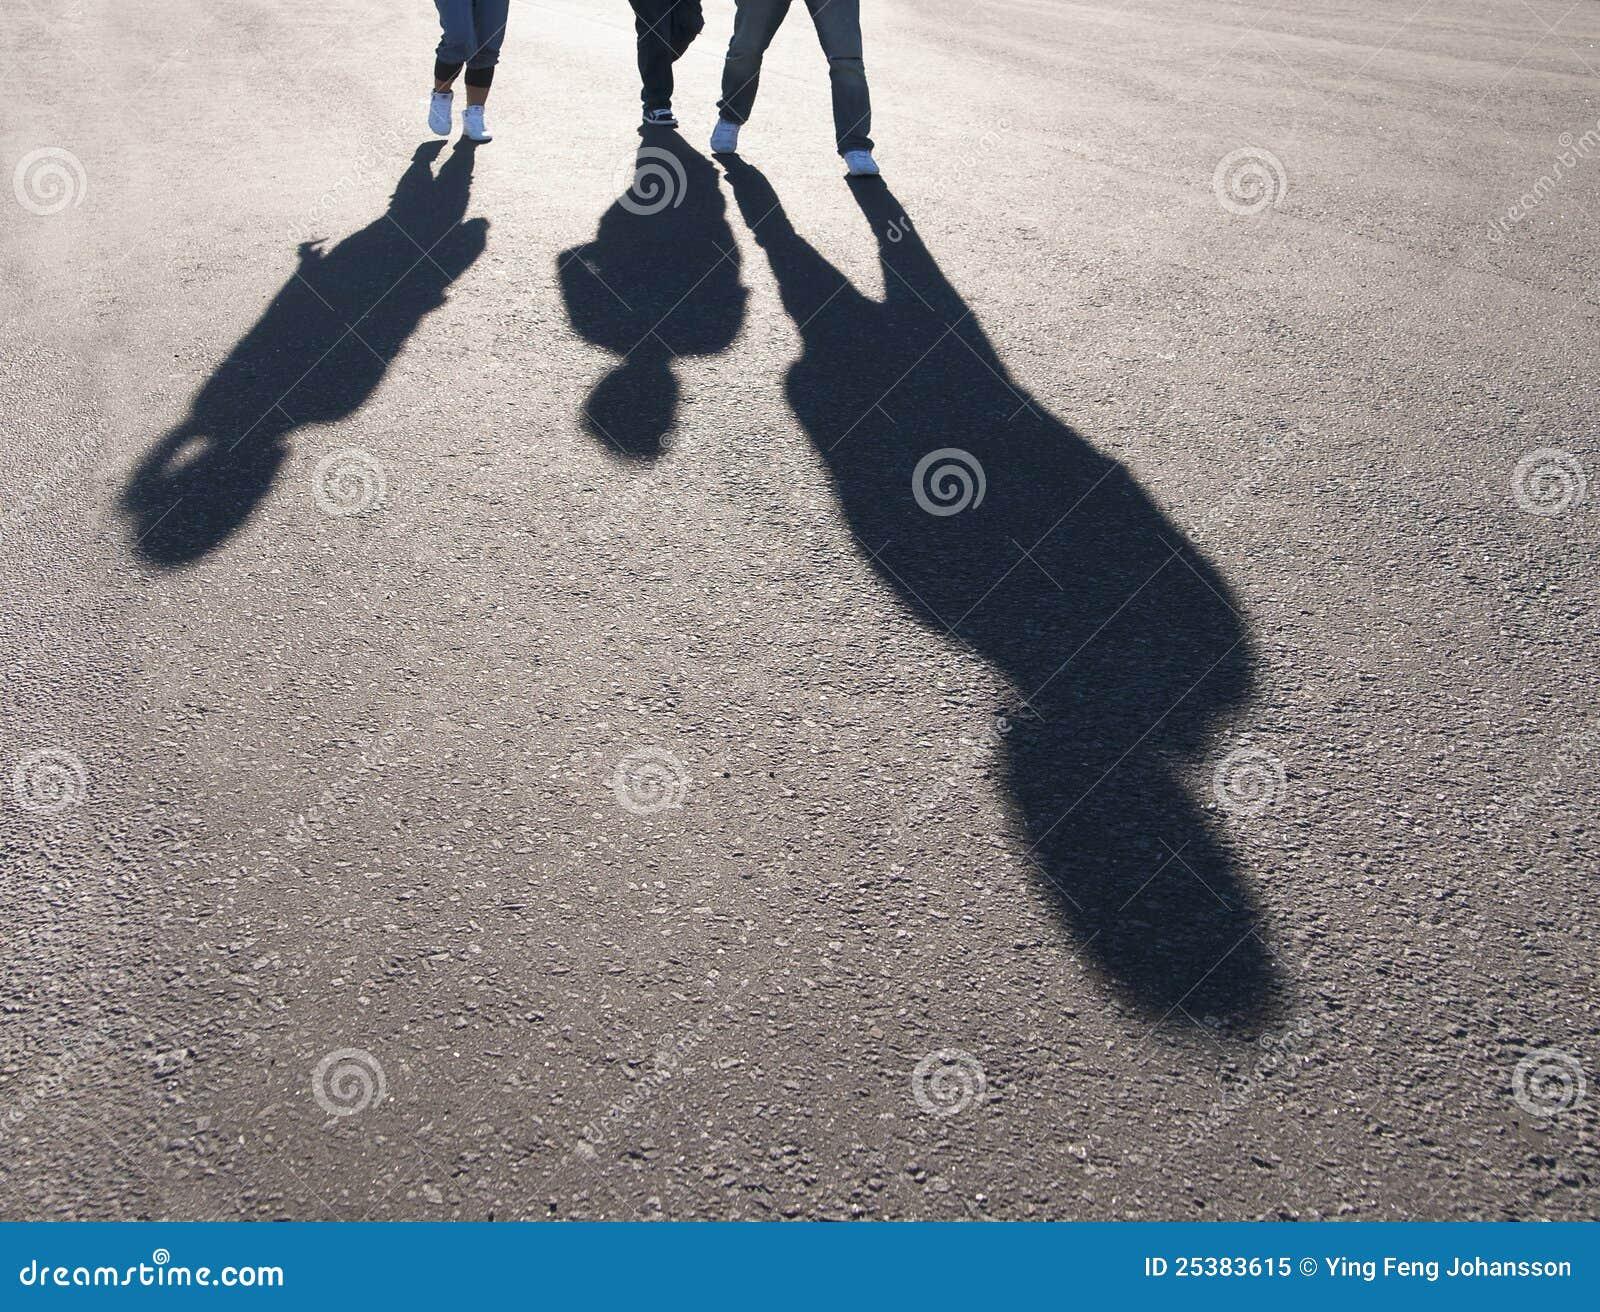 M Shadows 2012 Shadow Of People Royal...